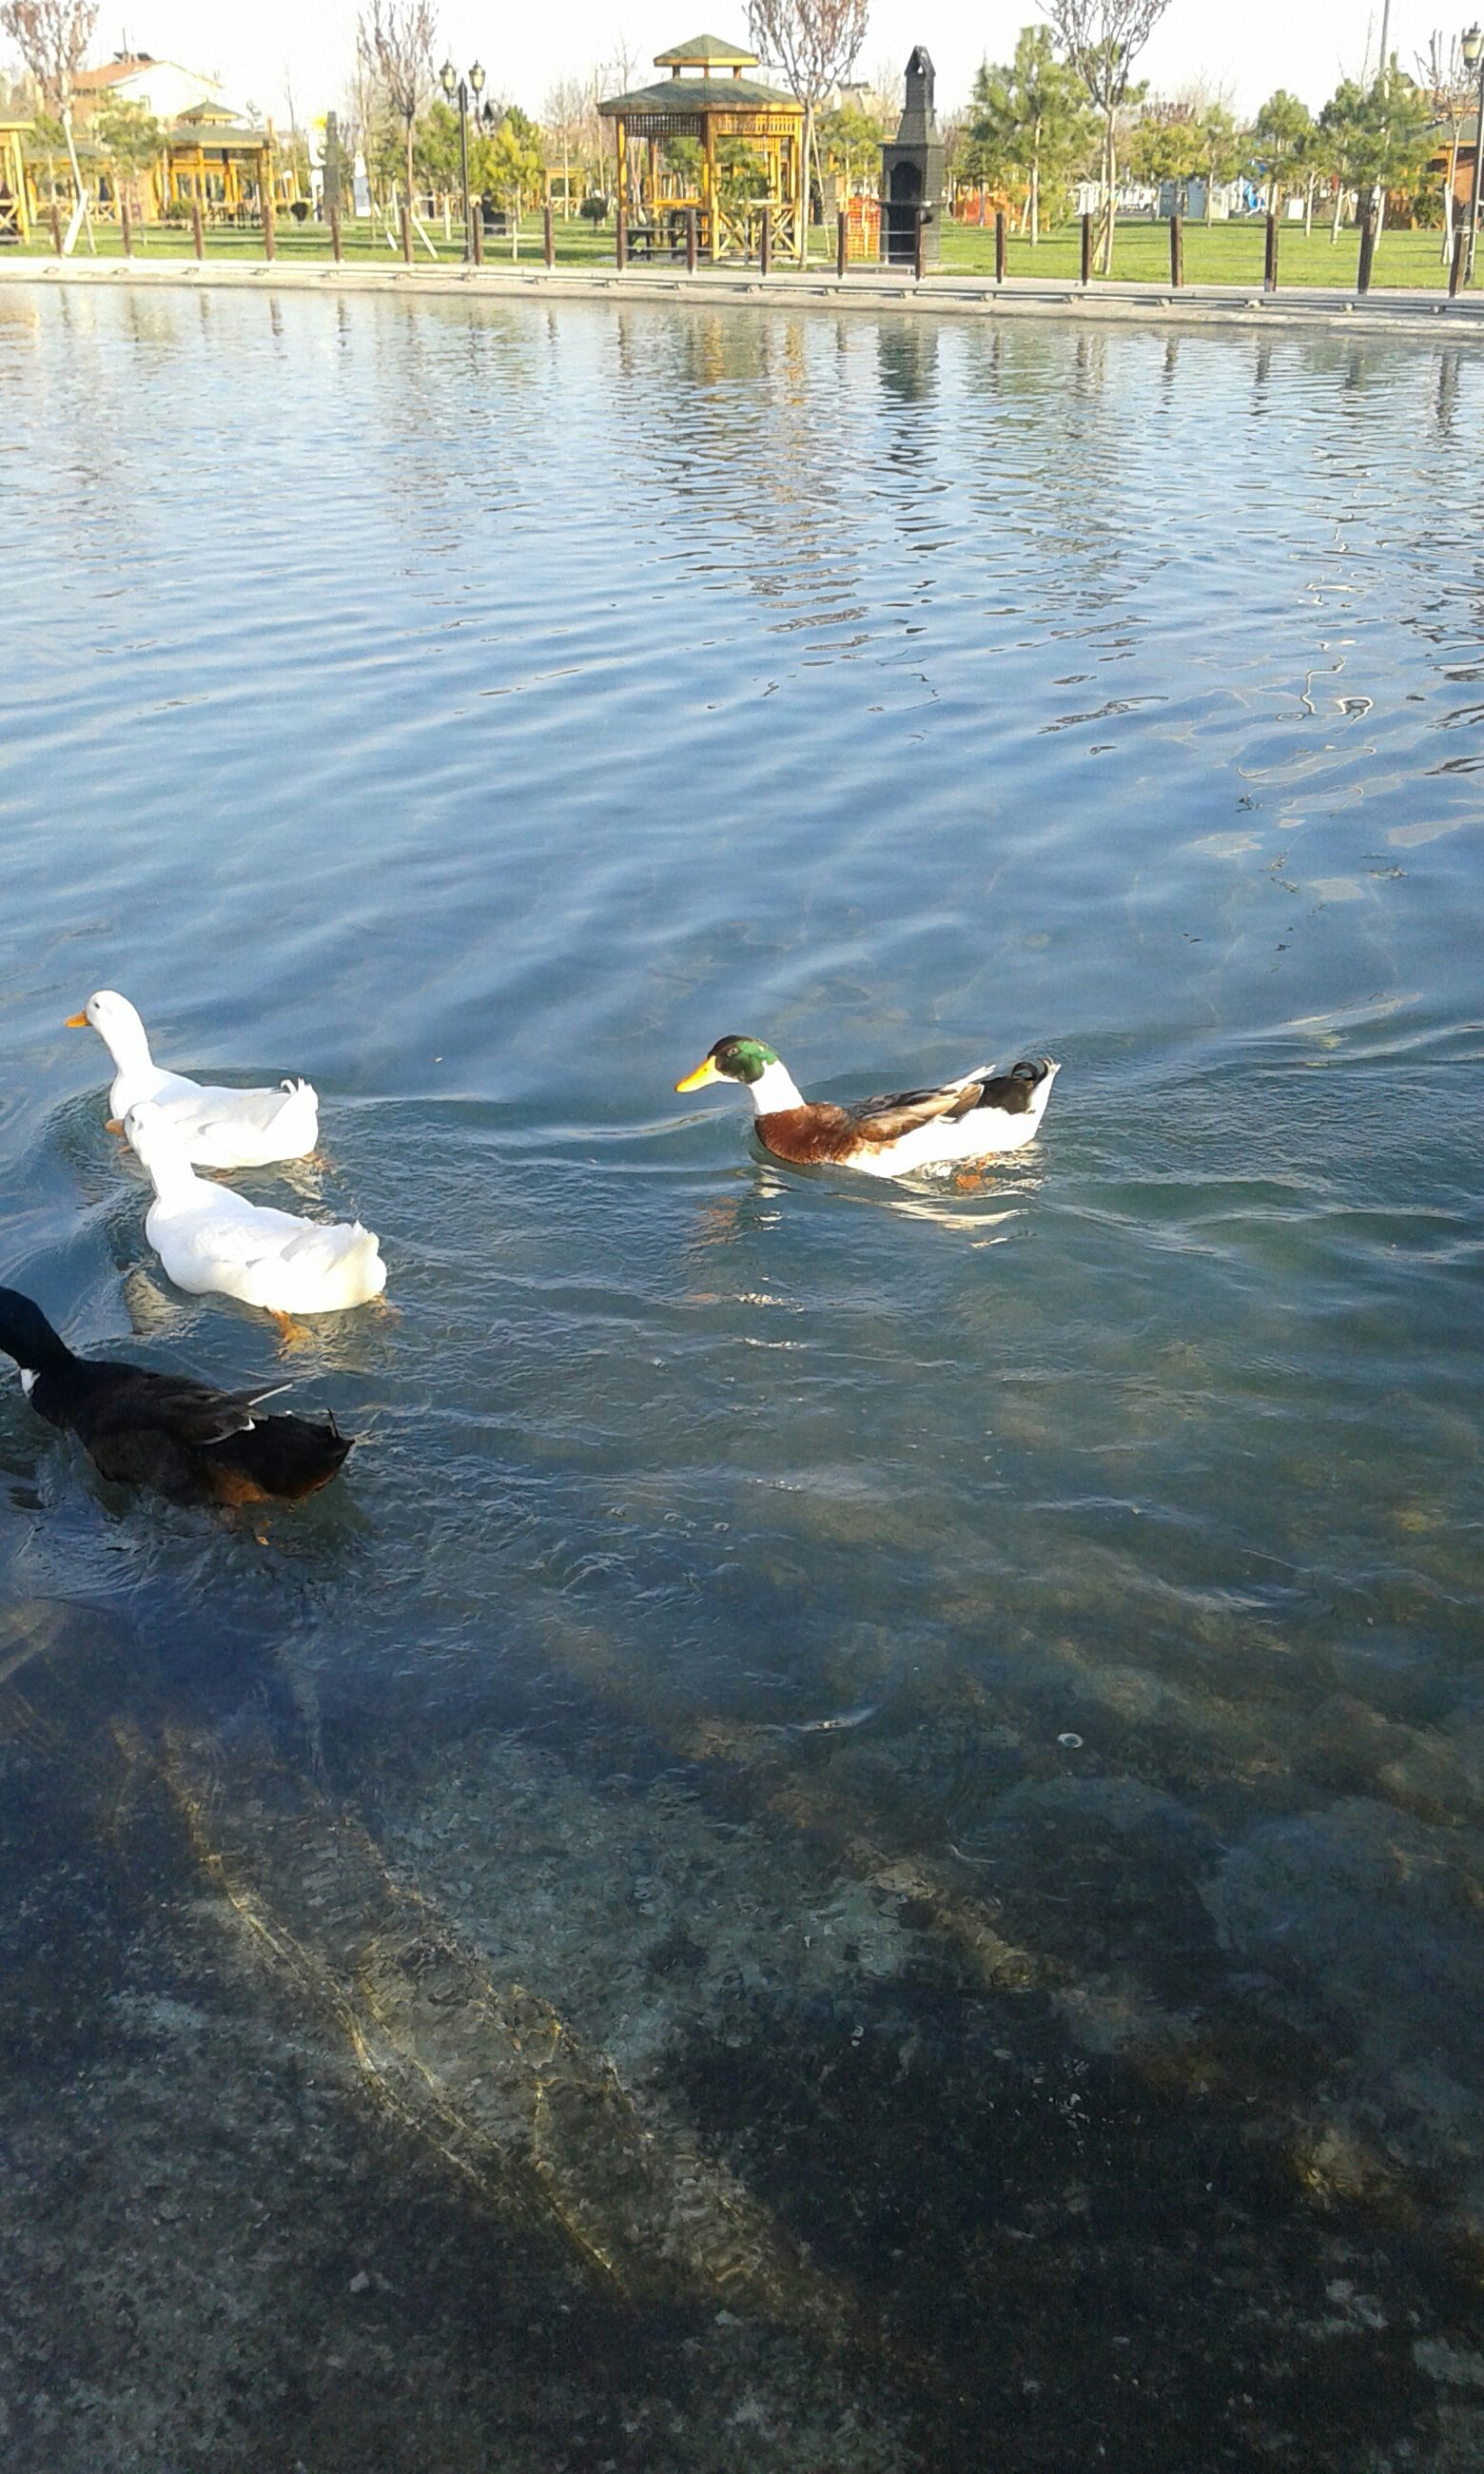 water, bird, animal themes, animals in the wild, wildlife, lake, swimming, reflection, swan, duck, waterfront, water bird, rippled, nature, medium group of animals, two animals, tree, river, pond